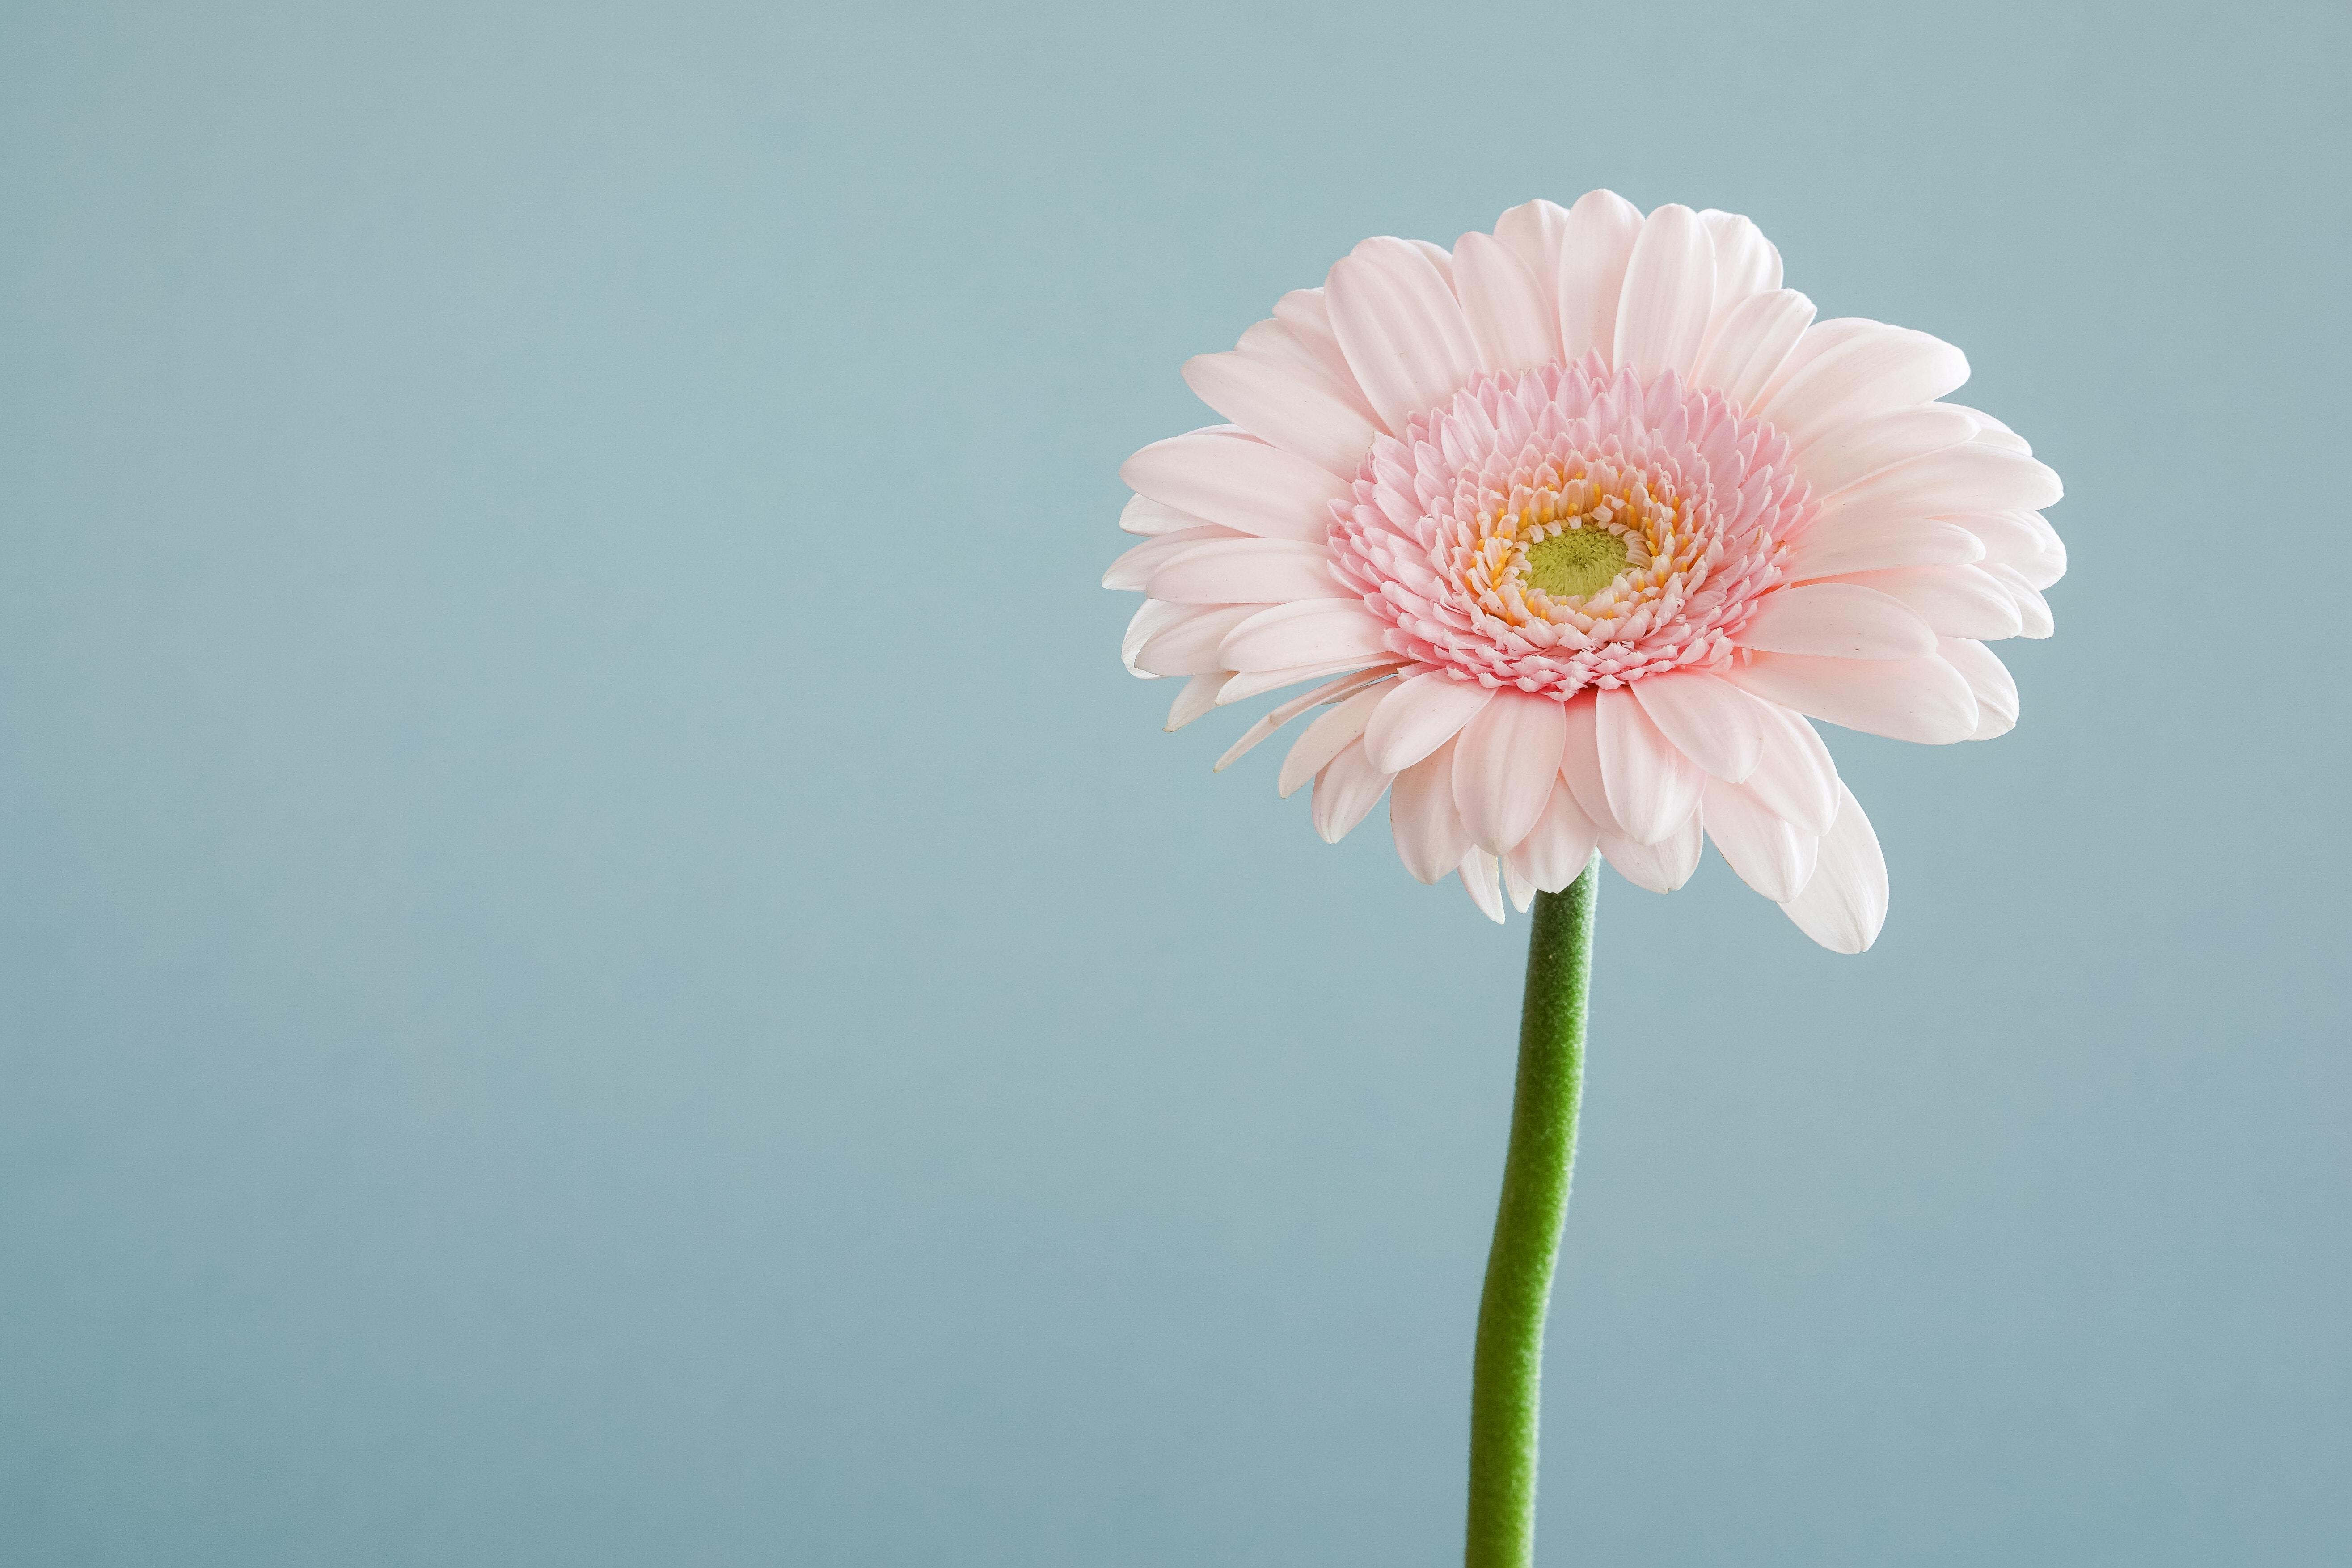 Close-up of a pastel pink gerbera flower